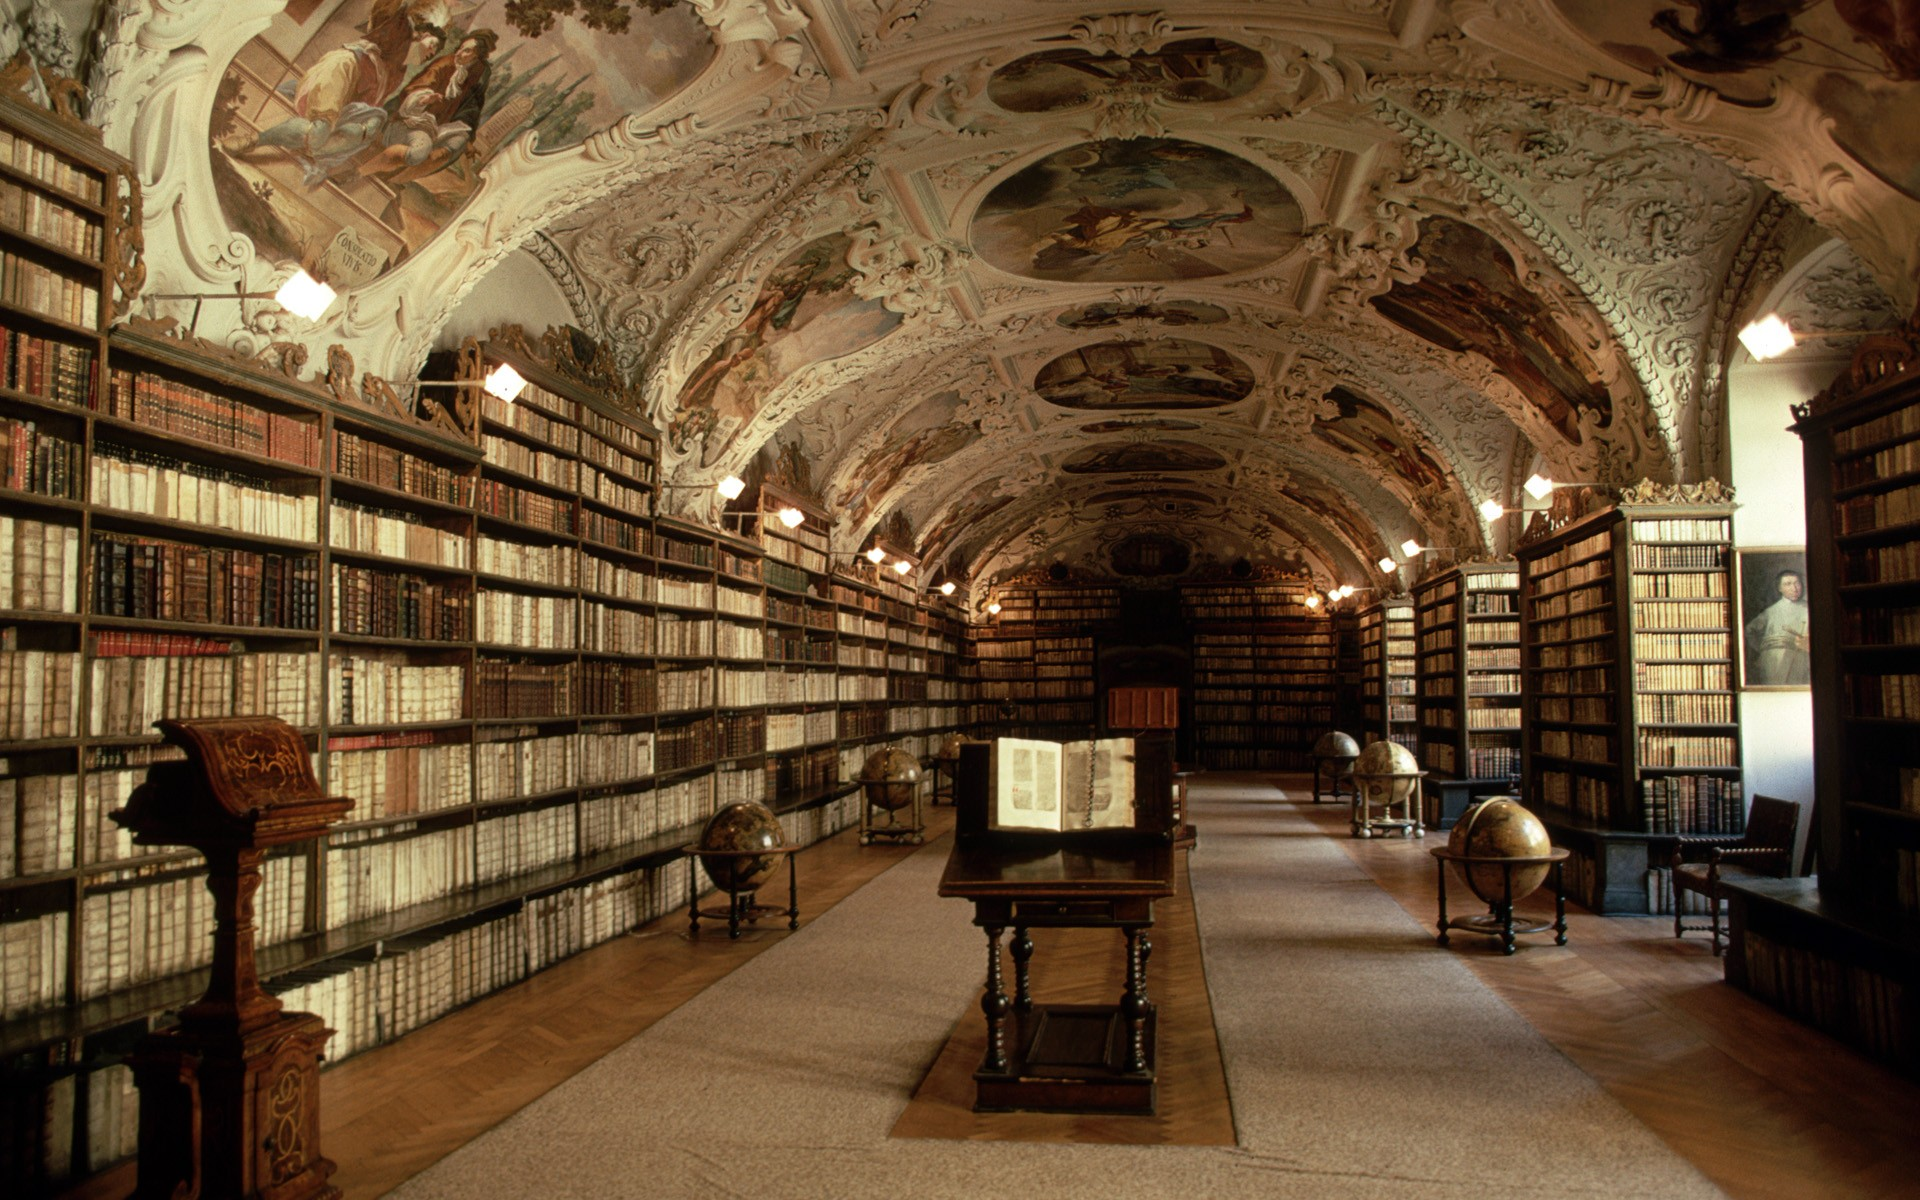 library buildings books bookshelf globe man made wallpaper background 1920x1200